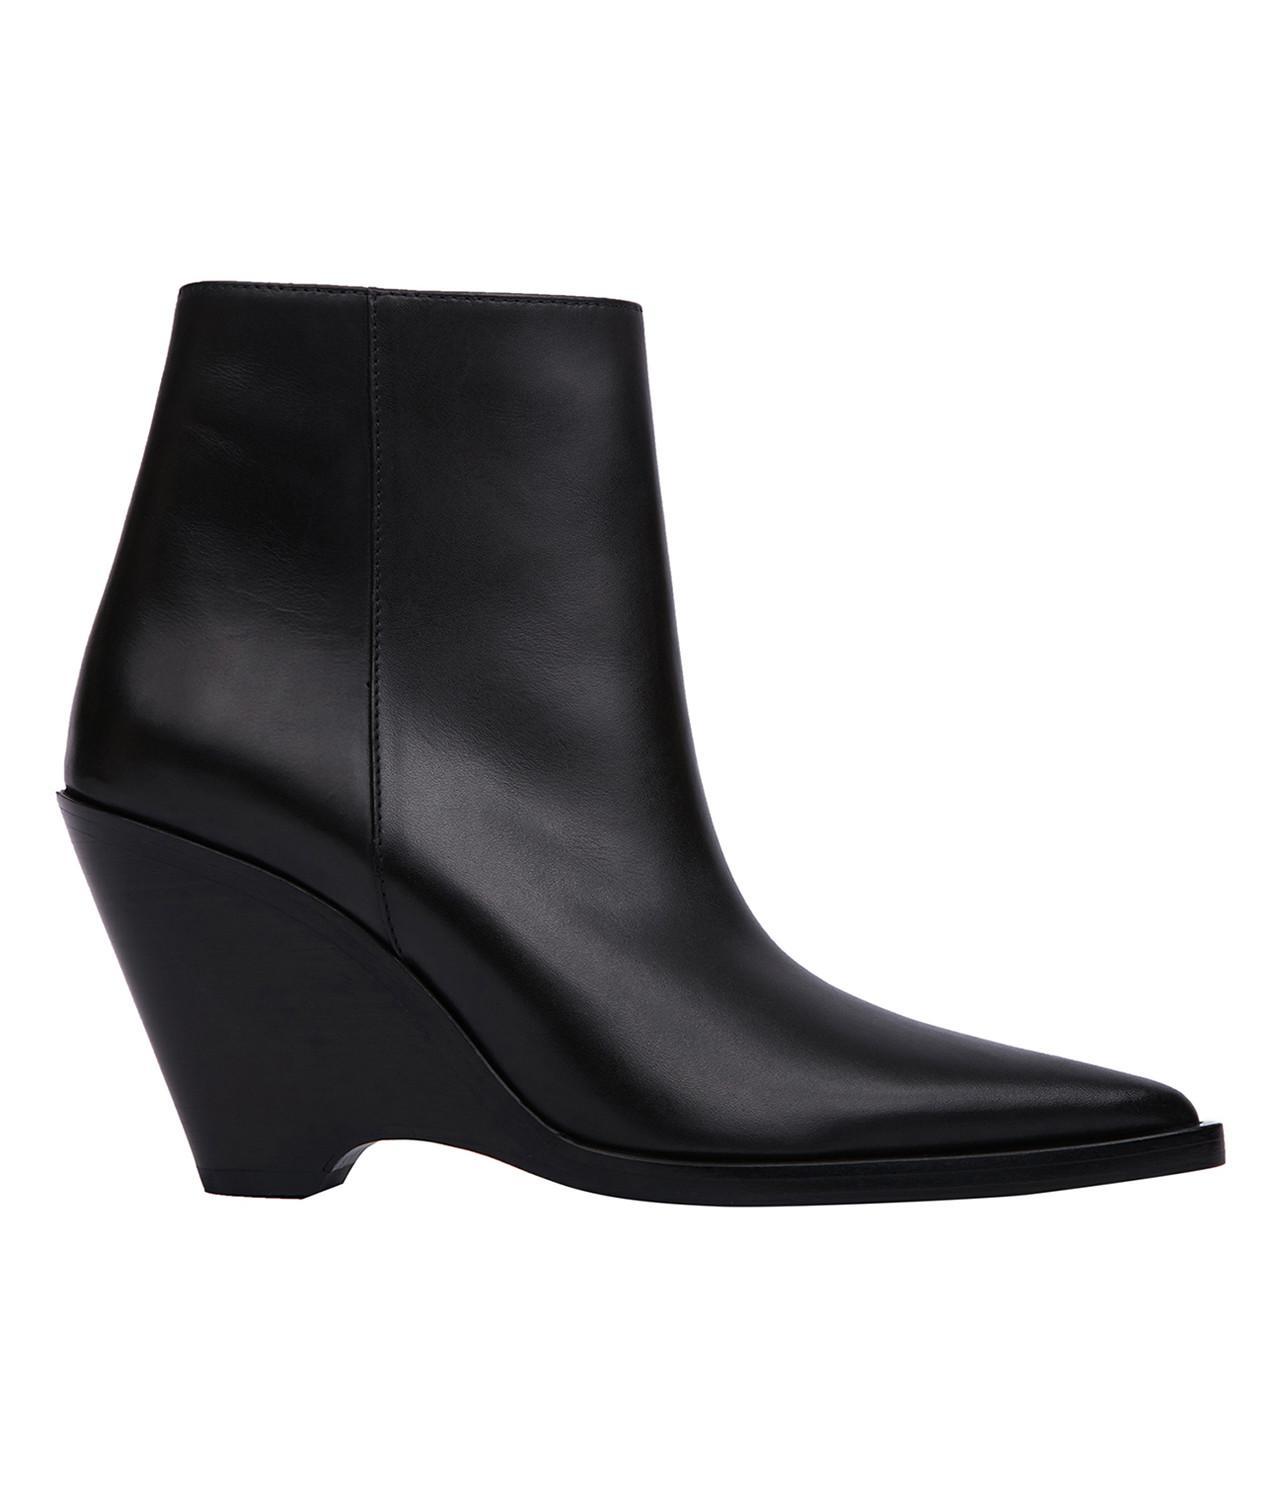 4ae120ecf067 Acne Studios. Women s Black Caroline Ankle Boot